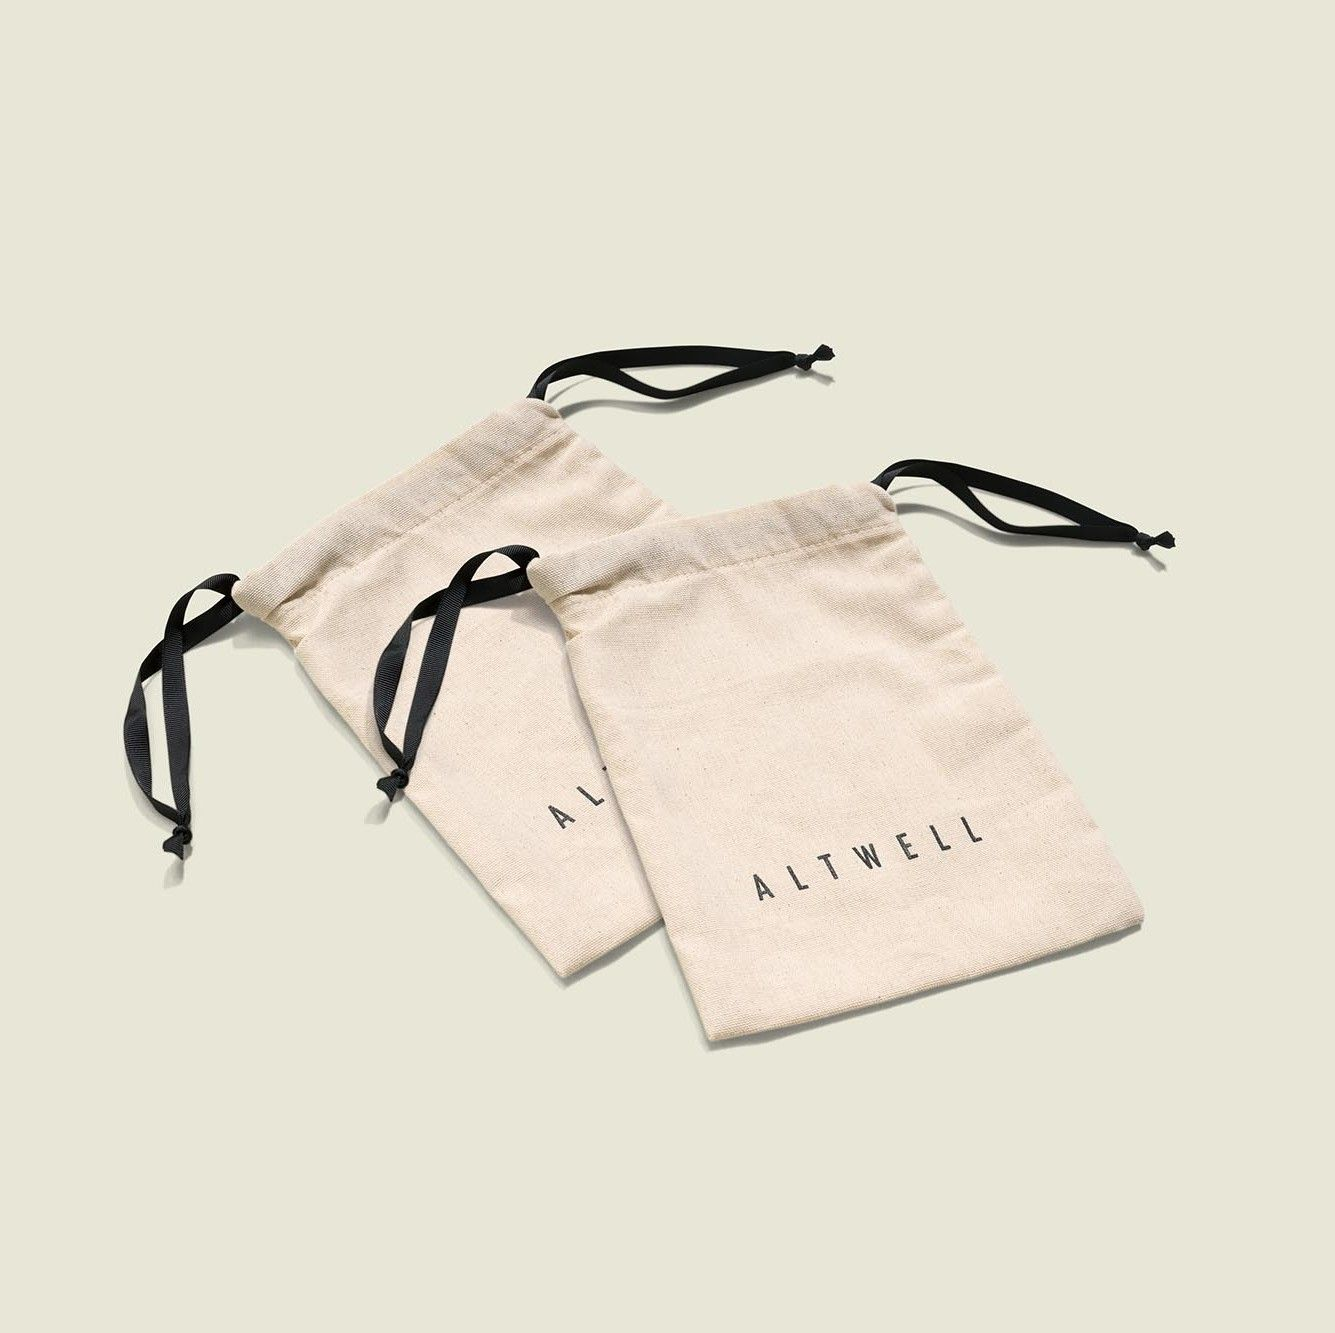 Two drawstring pouches